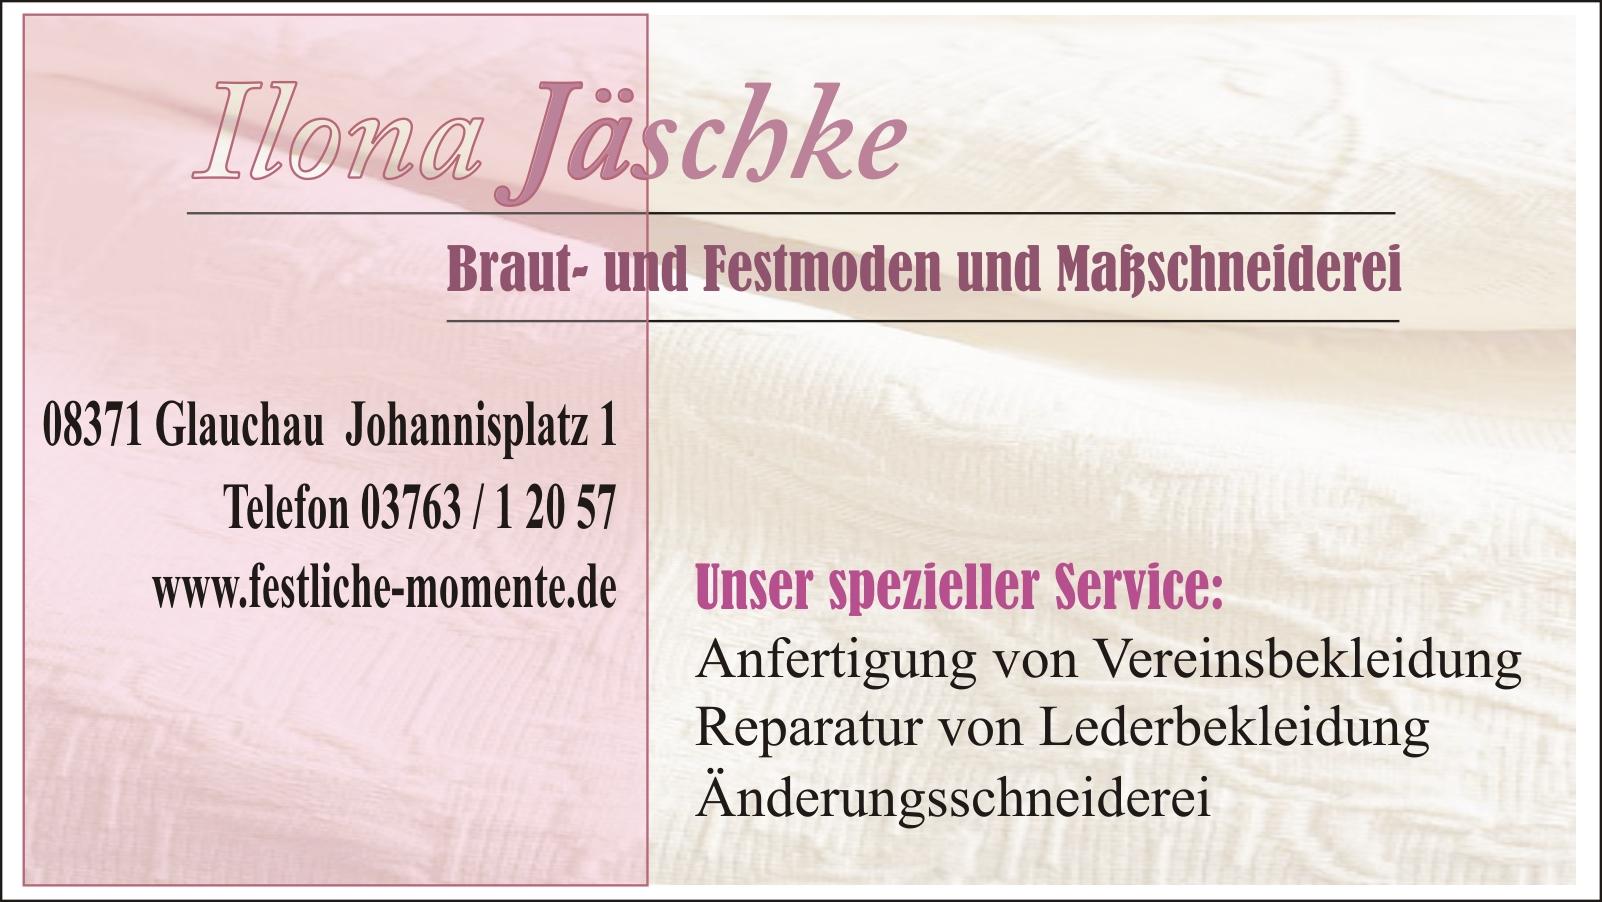 Maßschneiderei Ilona Jäschke